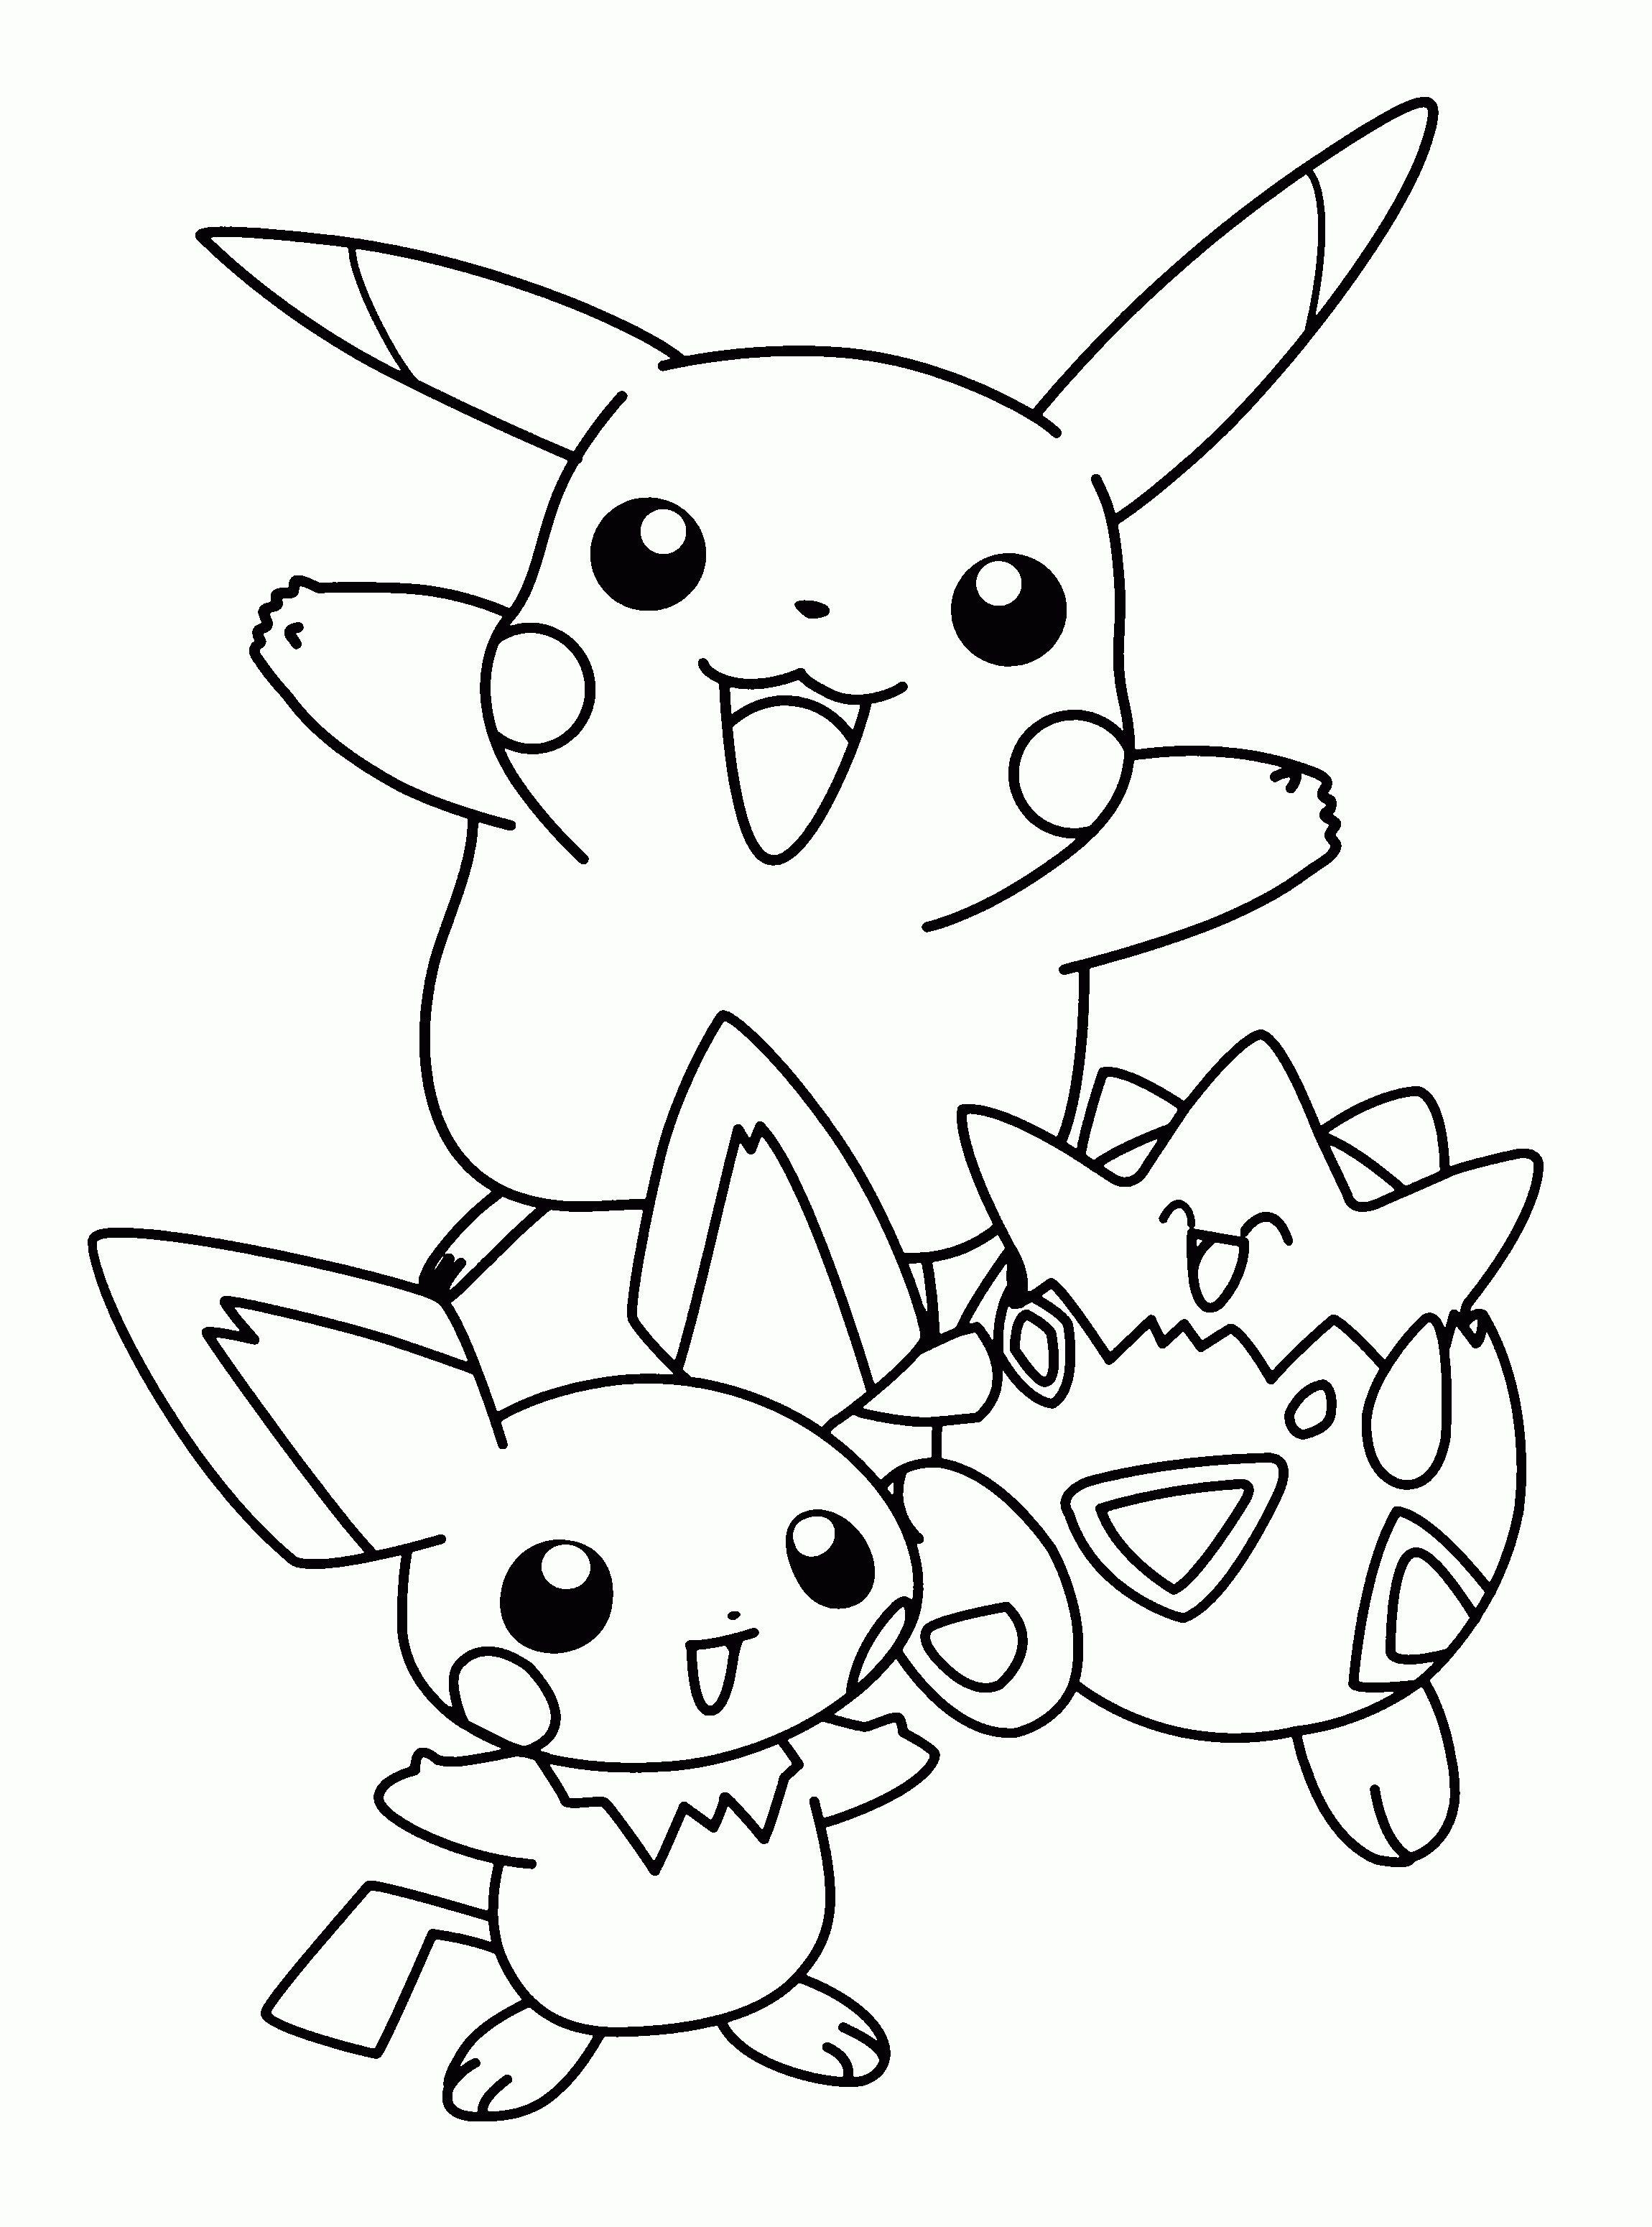 Pokemon Coloring Sheets Pokemon Coloring Sheets Pokemon Coloring Pages Coloring Books